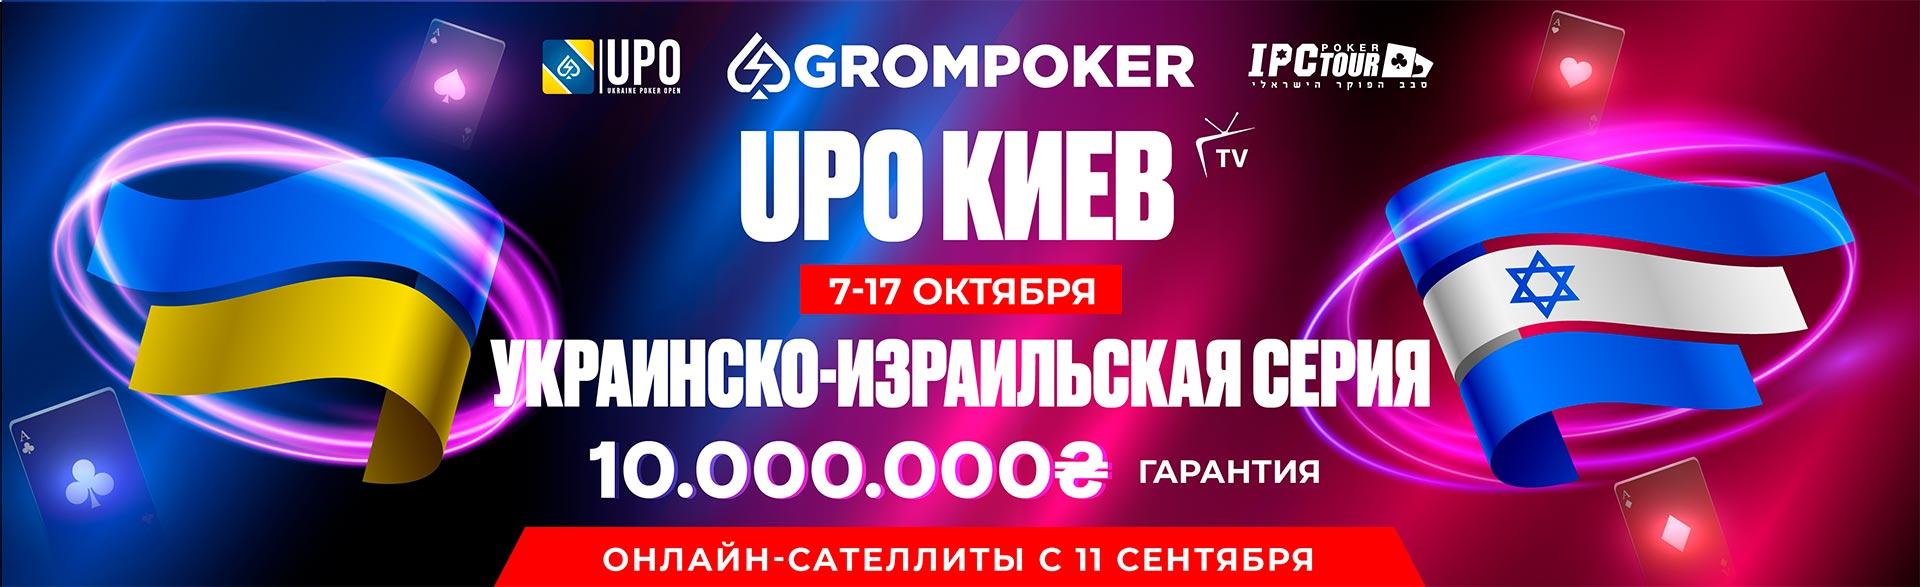 Grompoker UPO & IPC Киев